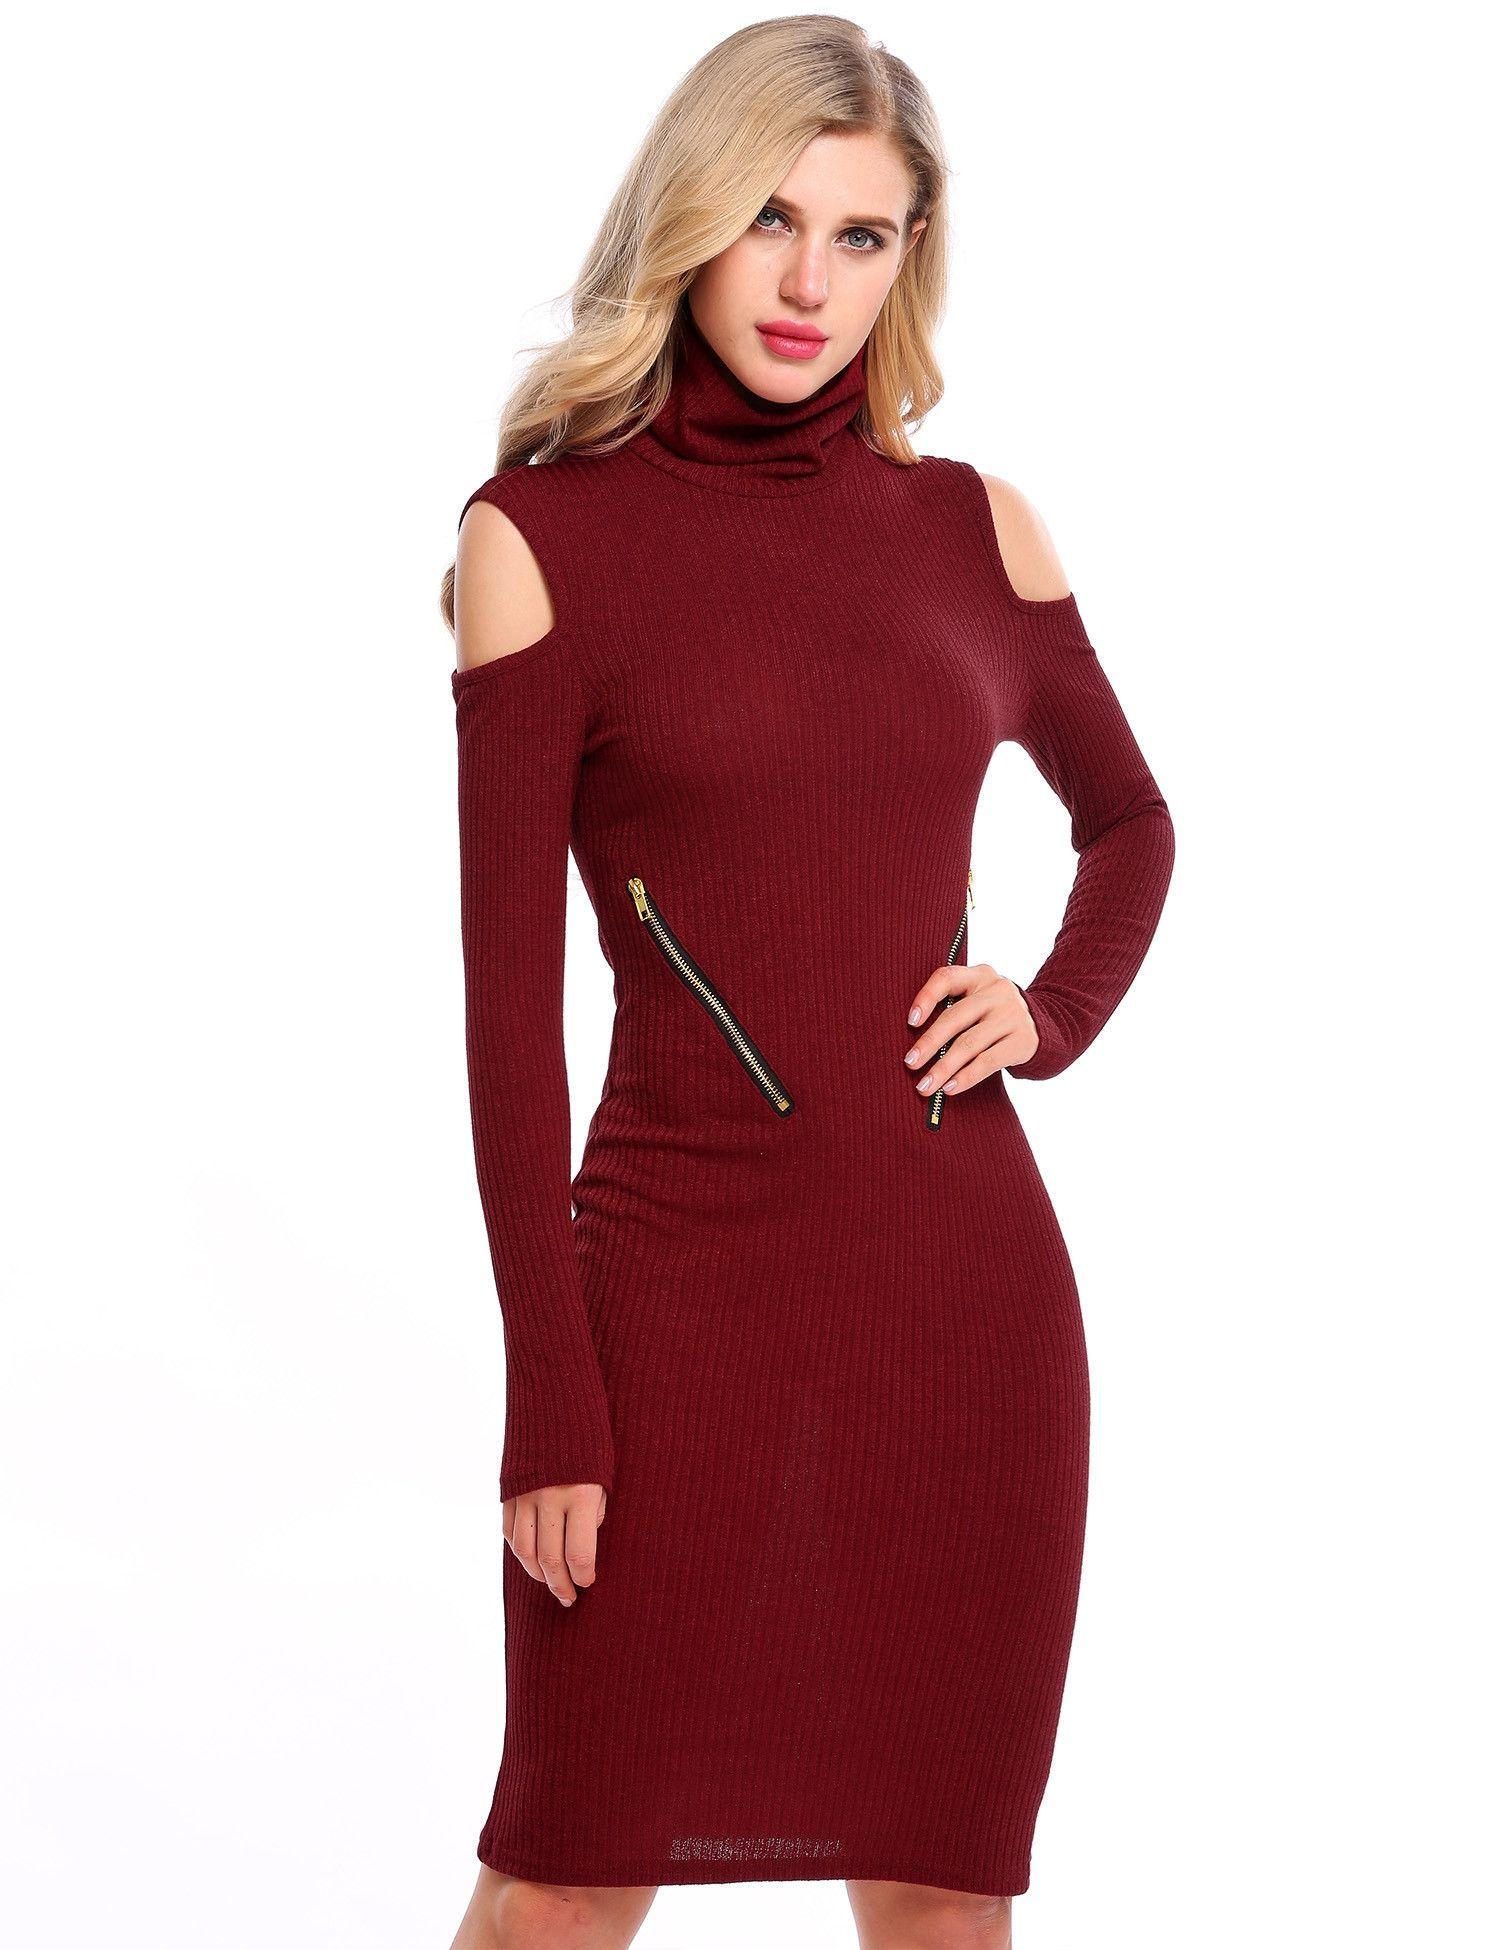 c01a31b714 White Turtleneck Cold Shoulder Zip Bodycon Sweater Dress